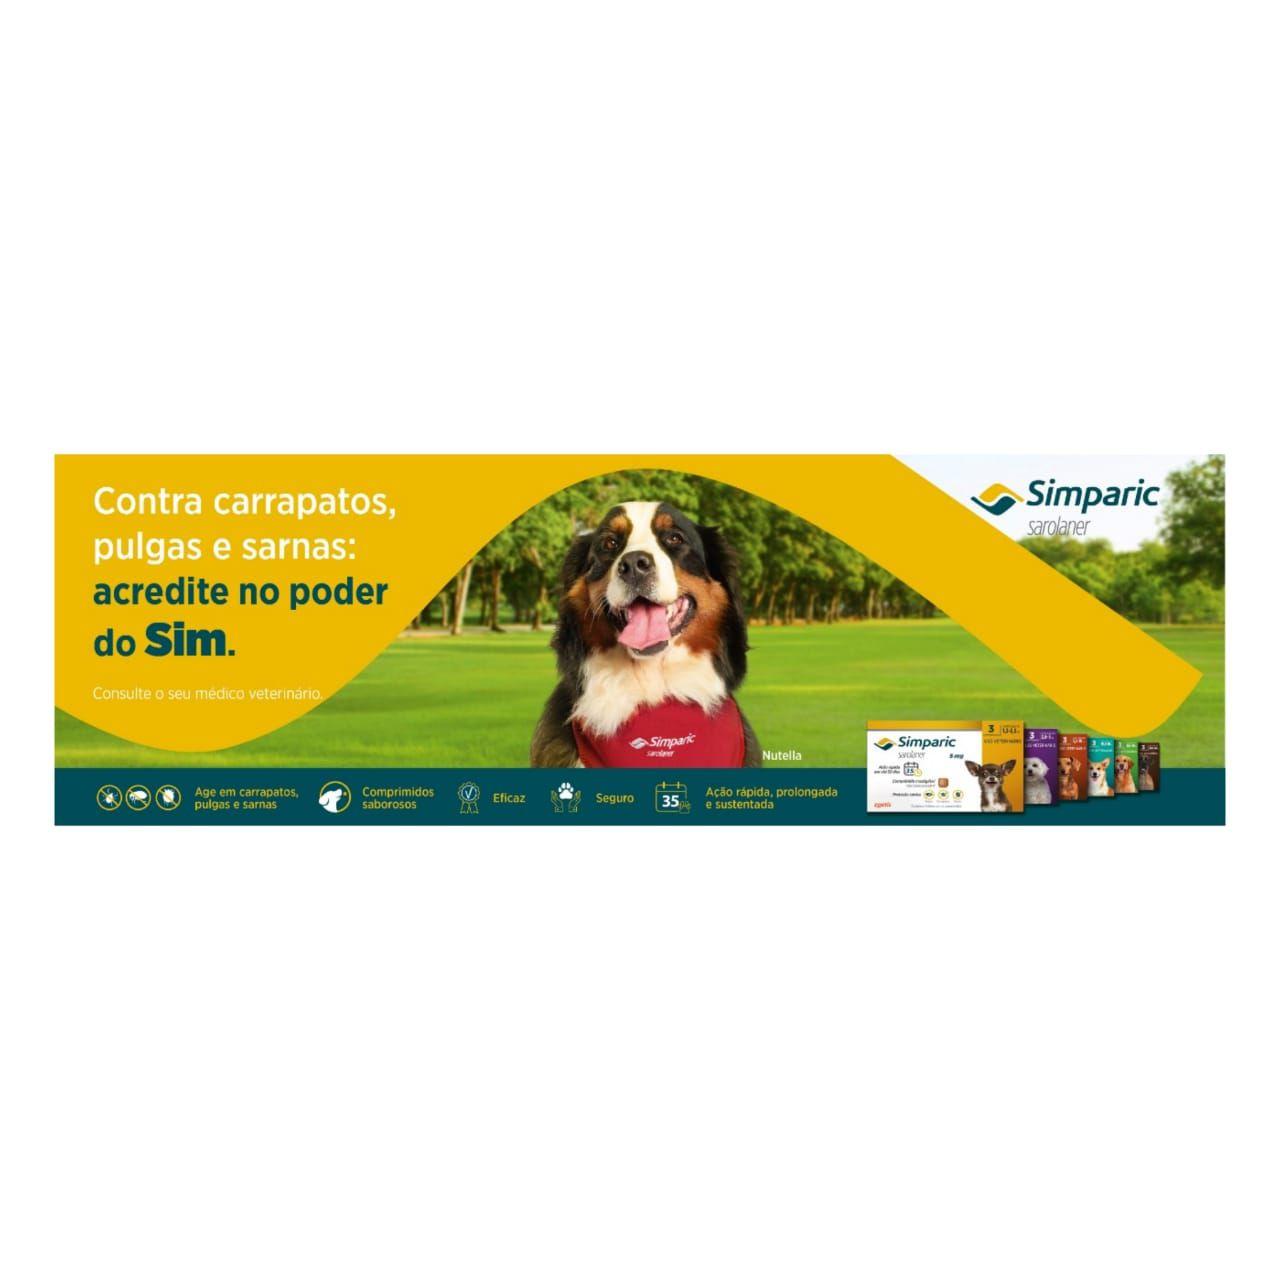 Antipulgas Zoetis Simparic 80mg para Cães 20 a 40Kg - 3 Comprimidos